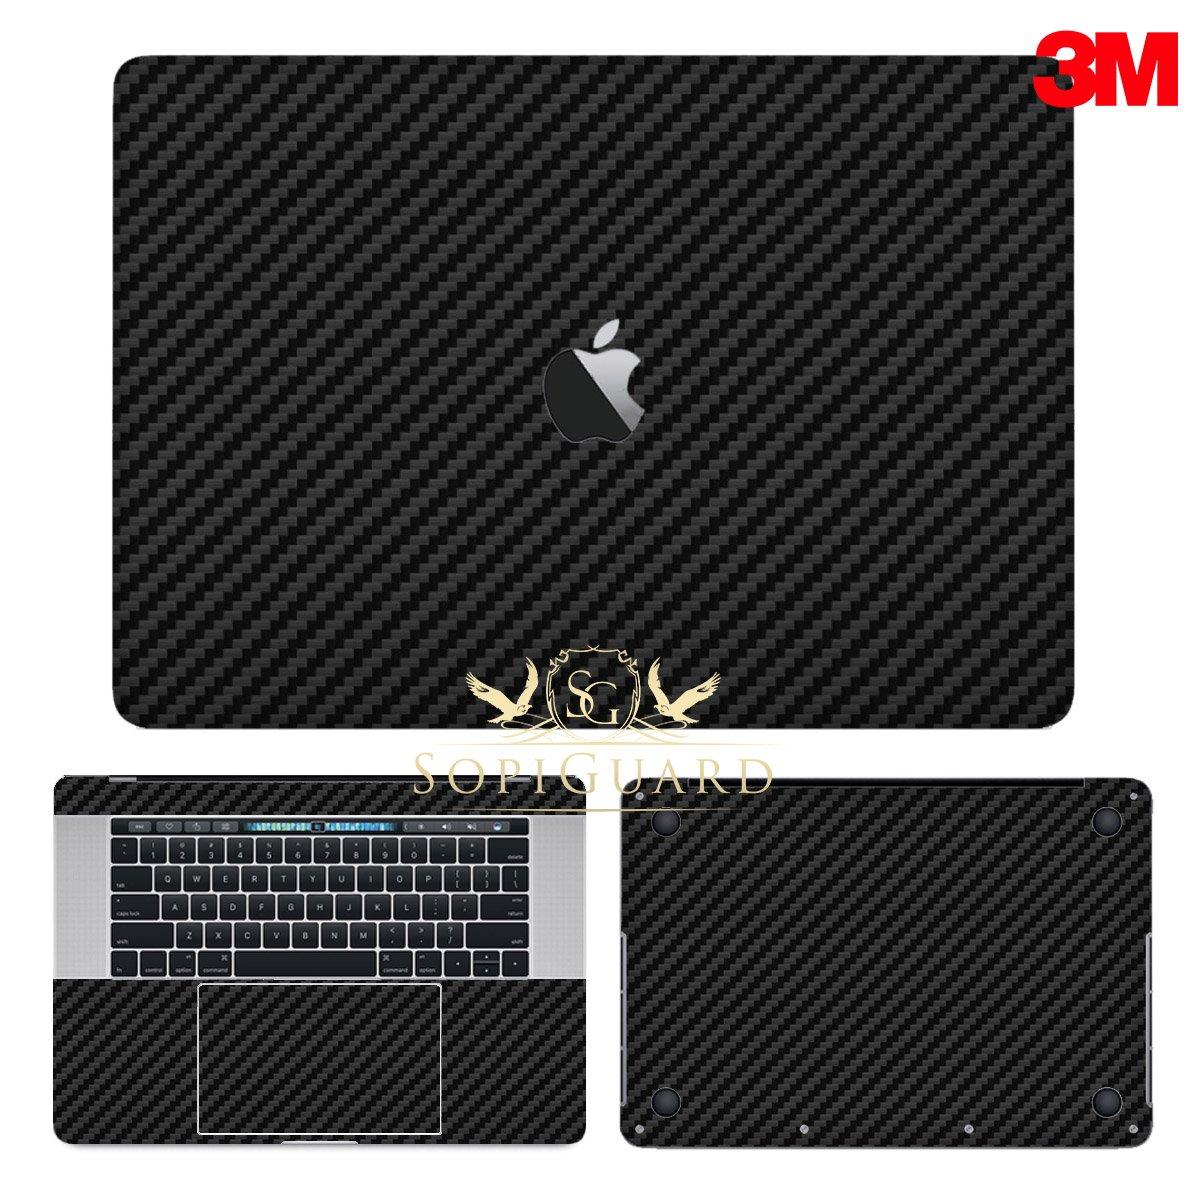 SopiGuard 3M Black Carbon Fiber Full Body Precision Edge-to-Edge Coverage Vinyl Sticker Skin for Apple Macbook Pro 15 Touch Bar (A1707 A1990)